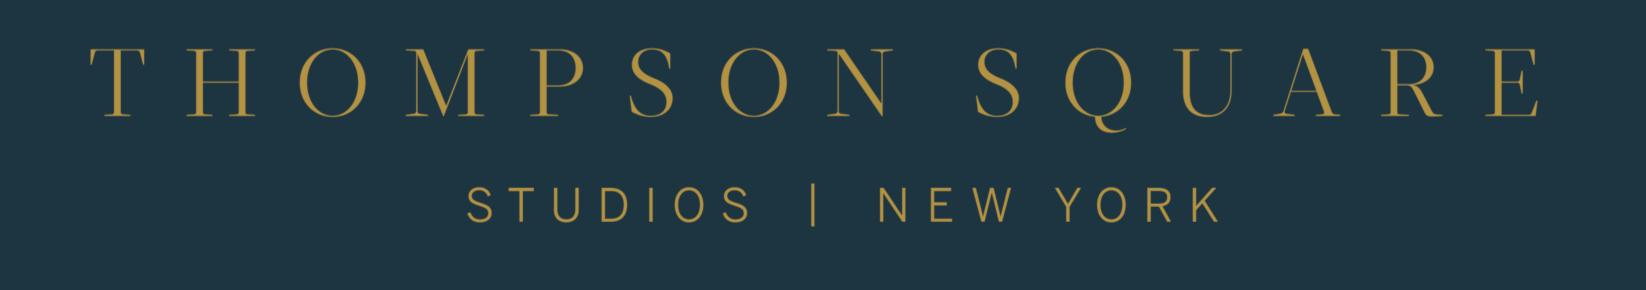 thompson-square-studios-new-york-city